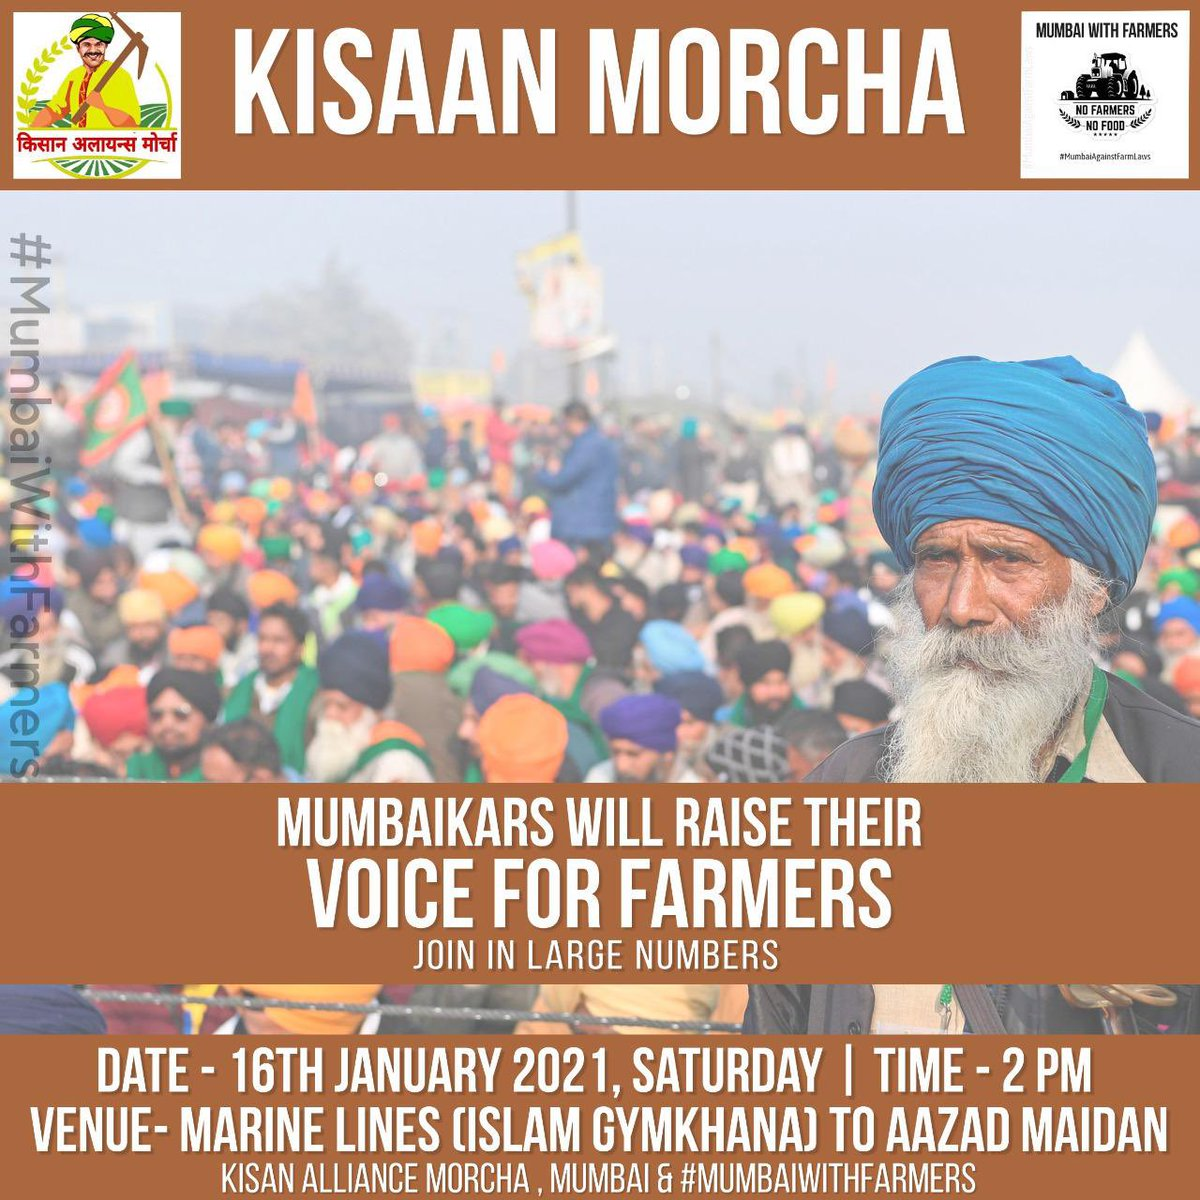 Mumbaikars! This is todayyyyyy!!Chalooooooooo! Stand up for those who feed us! #RoarForFarmersRights #FarmersProtests #NoFarmersNoFood #mumbaiWithFarmers #takebackfarmlaws  @FahadBombay @anuragkashyap72  @anubhavsinha @konkonas @RichaChadha @SethShruti @minimathur @shunalishroff